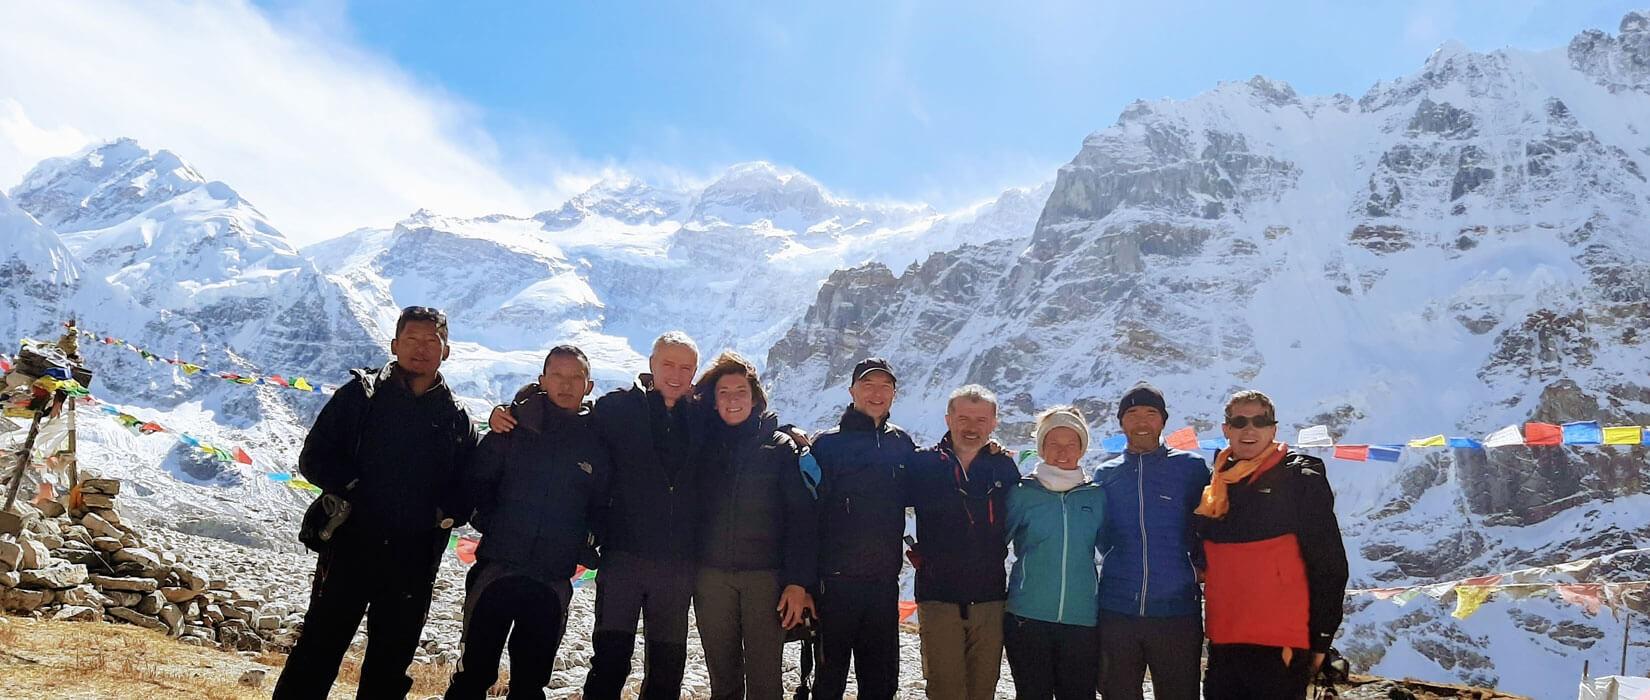 Kanchenjunga North Base Camp(5140 M)